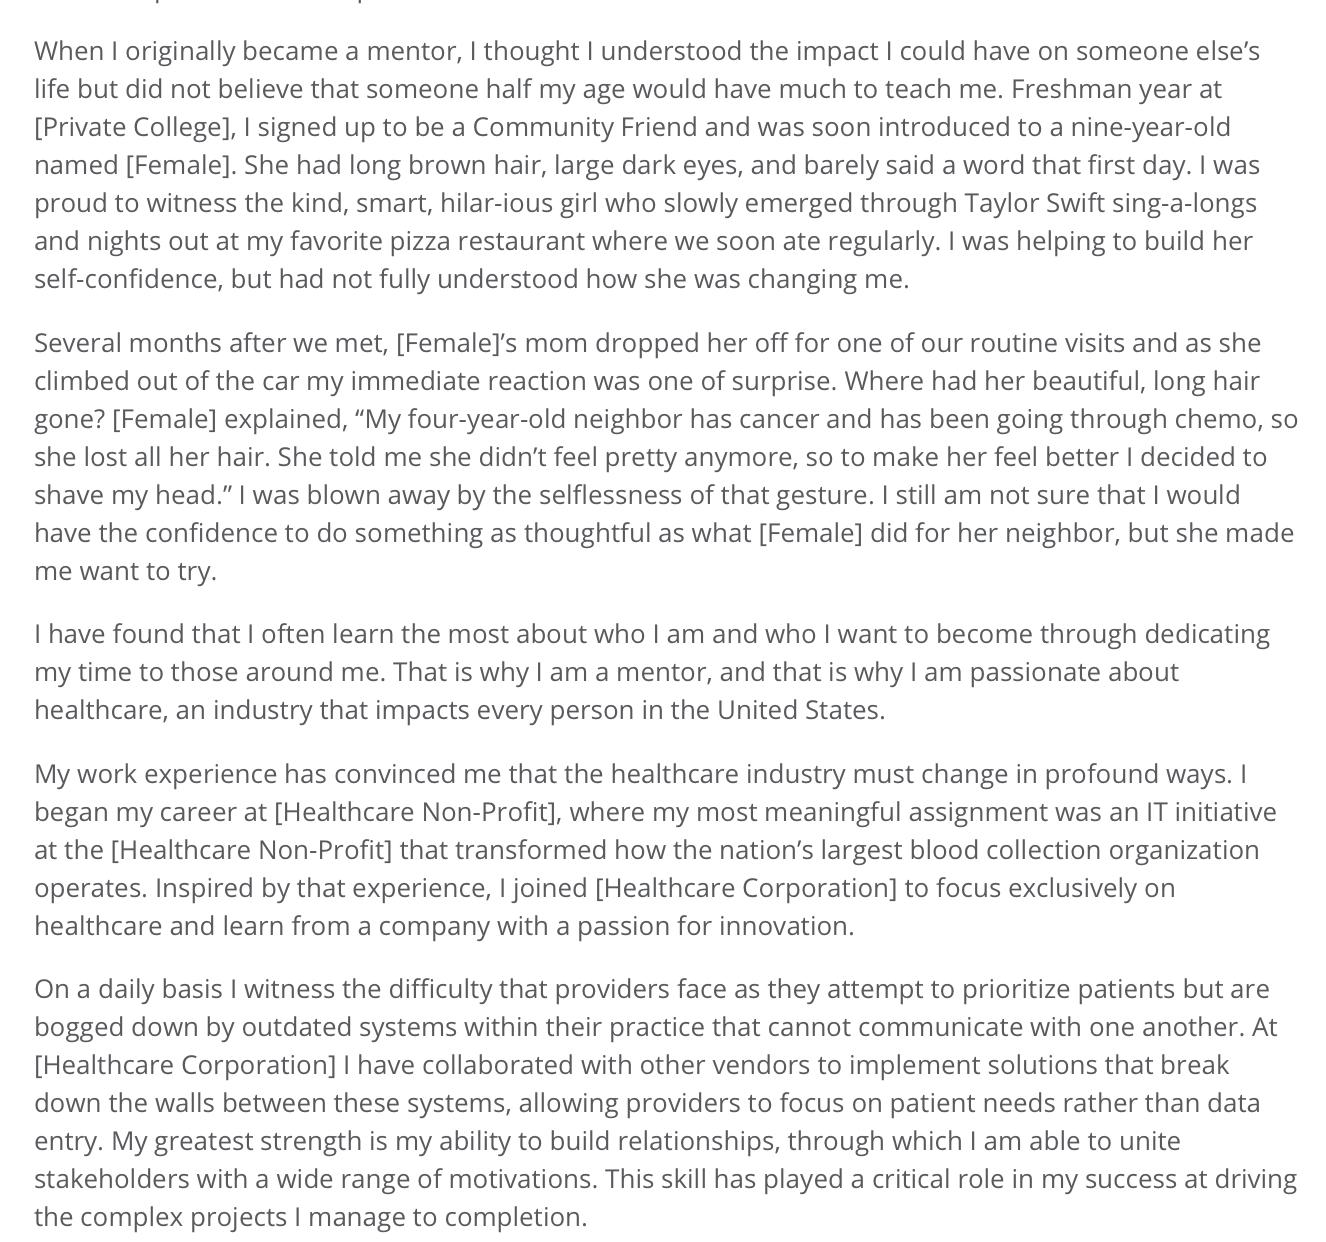 Harvard business school example essay